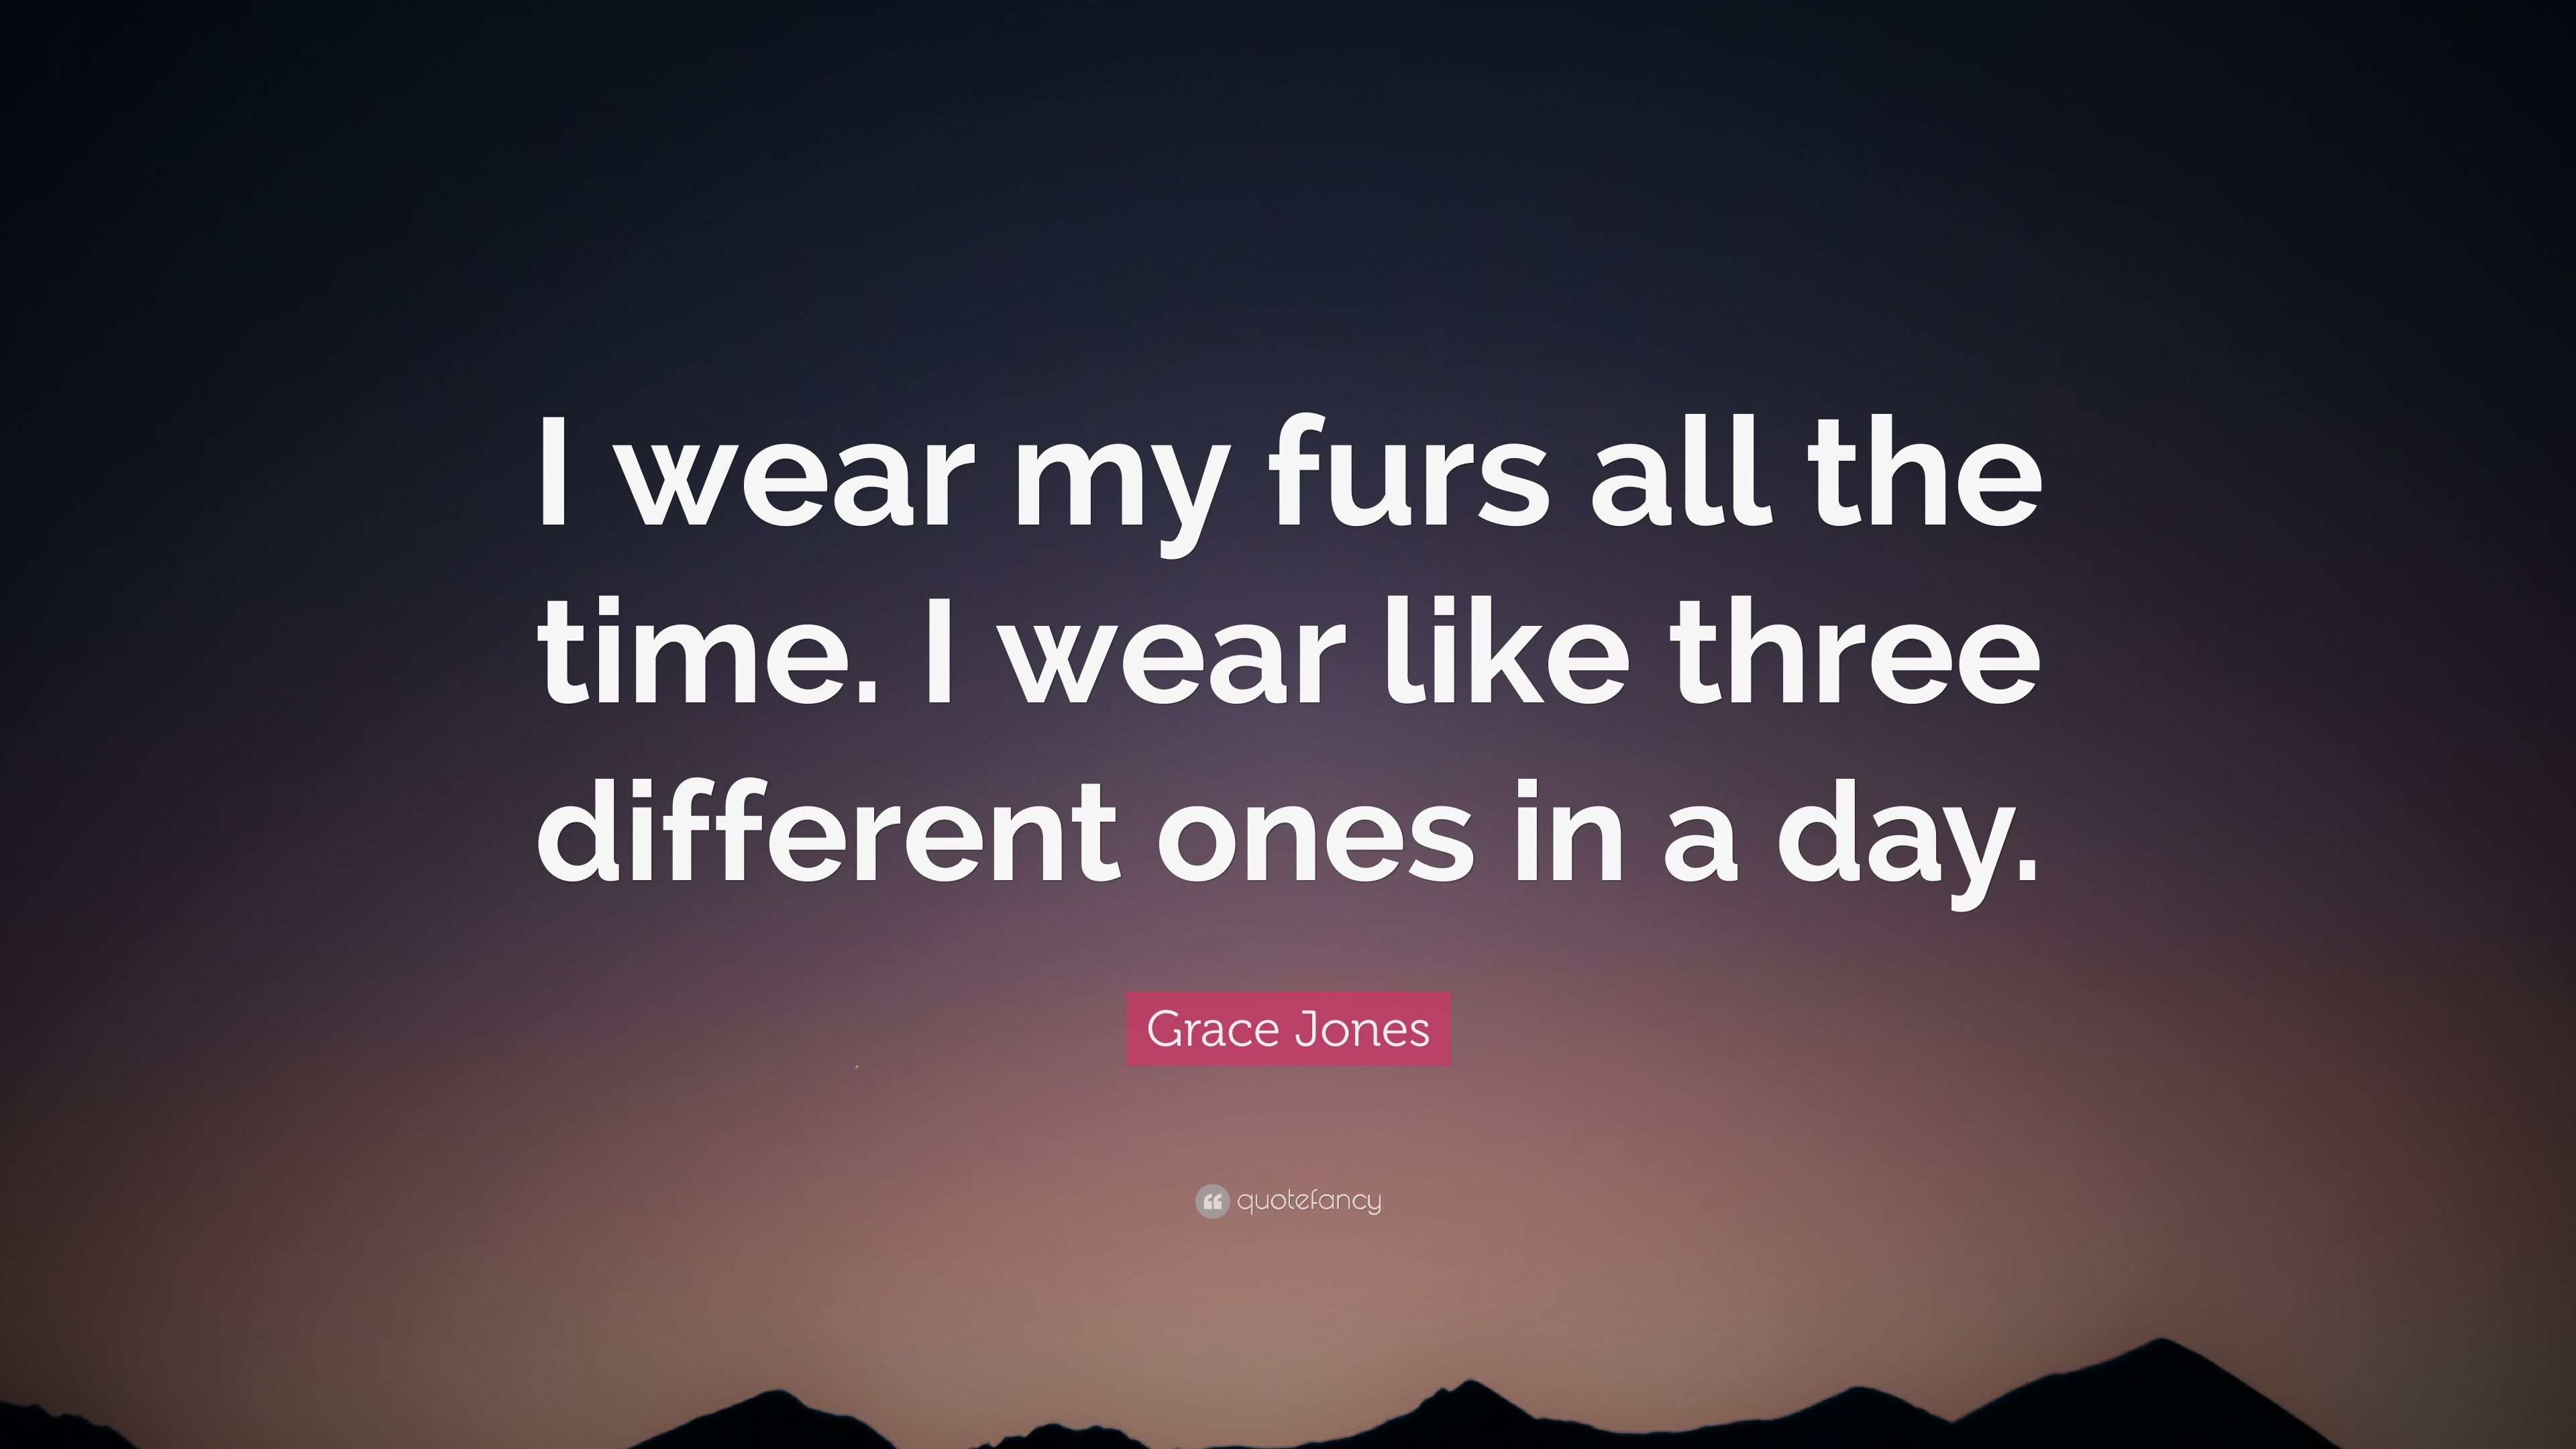 Grace Jones Quote I Wear My Furs All The Time I Wear Like Three